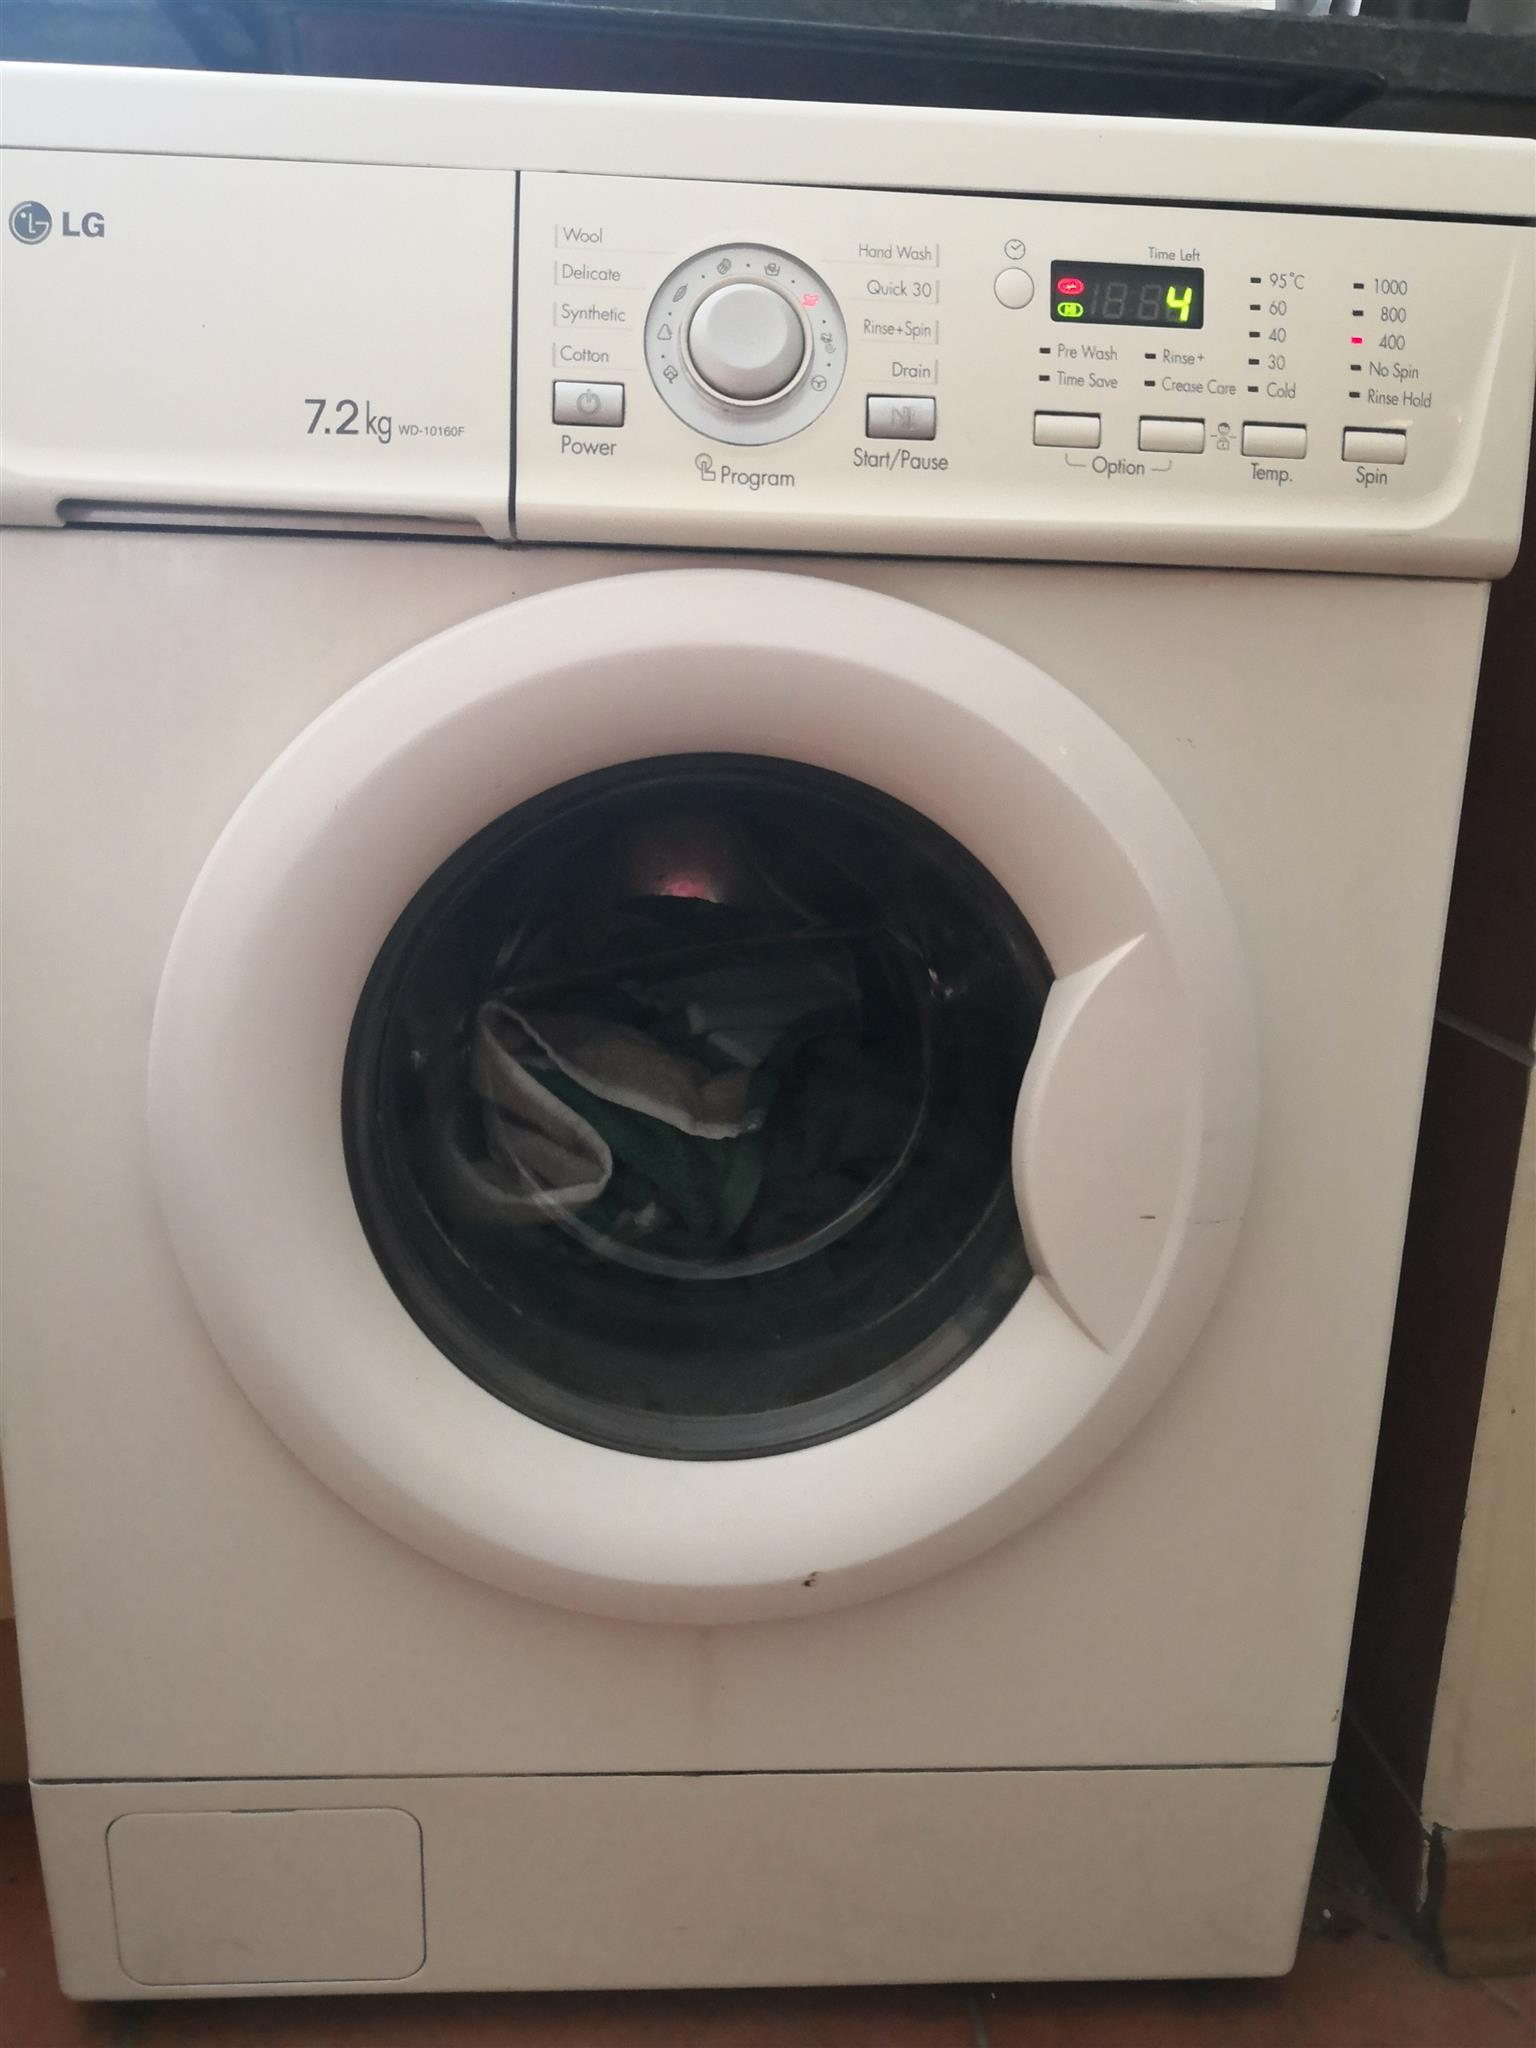 front loader washing machine 7.2kg working order